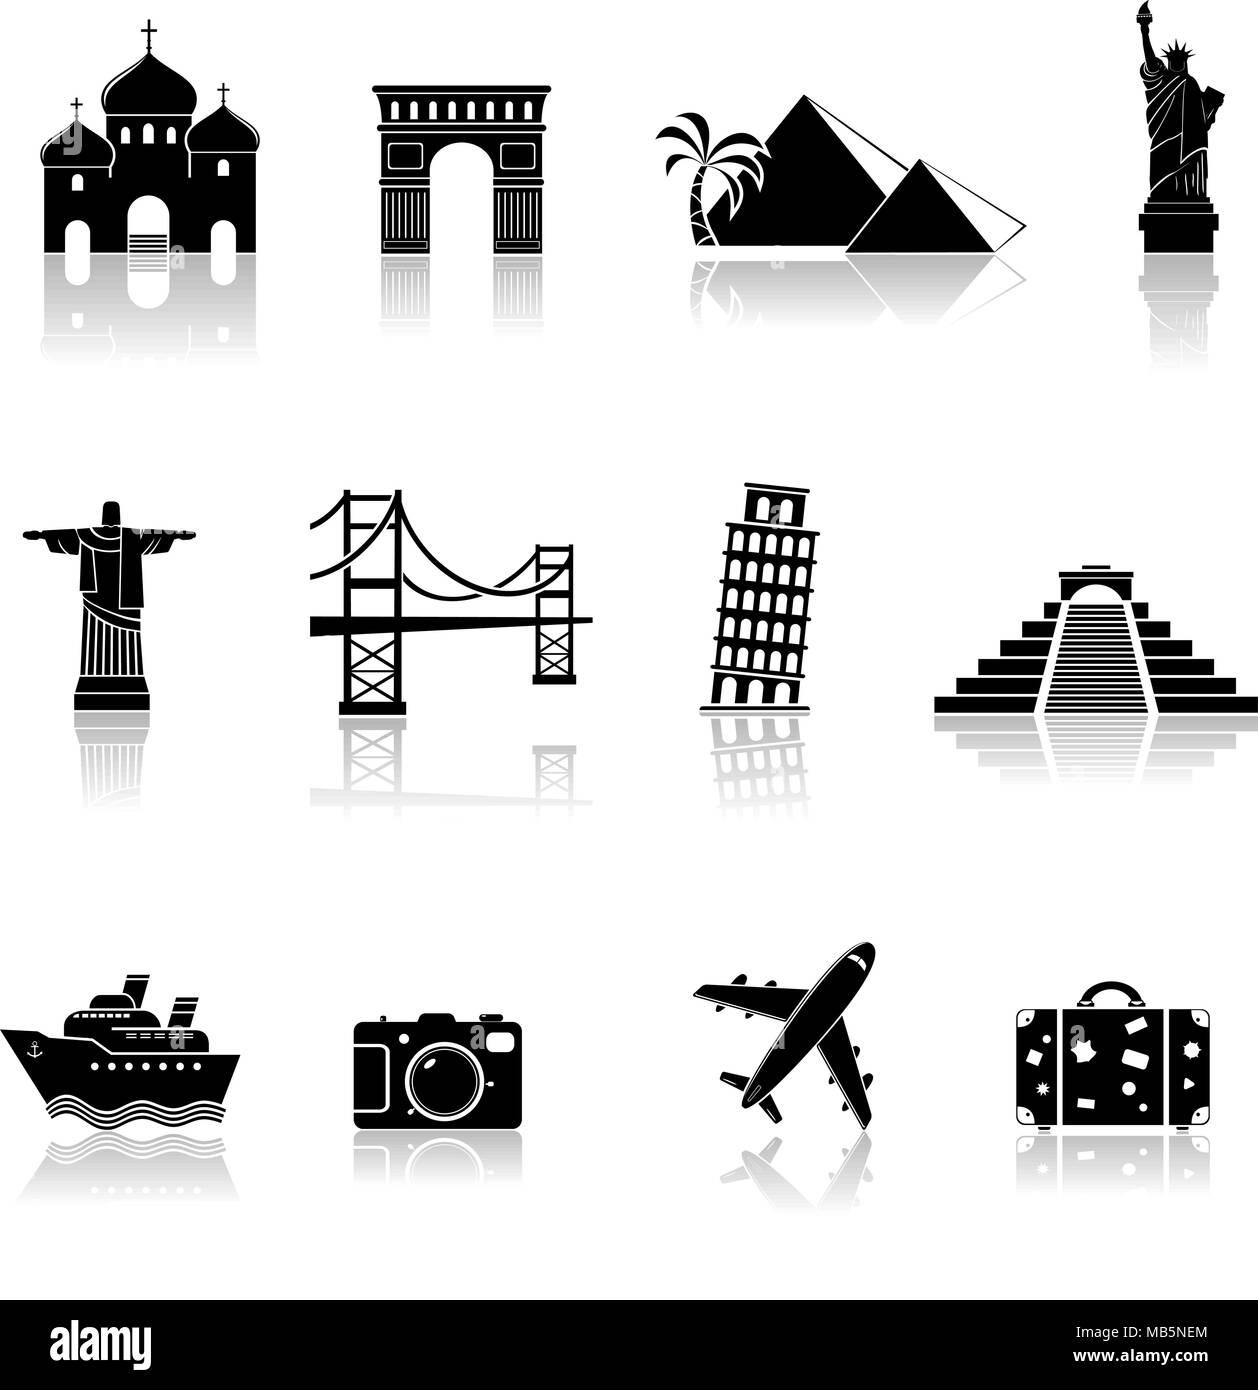 Travel and landmarks icons - Stock Image